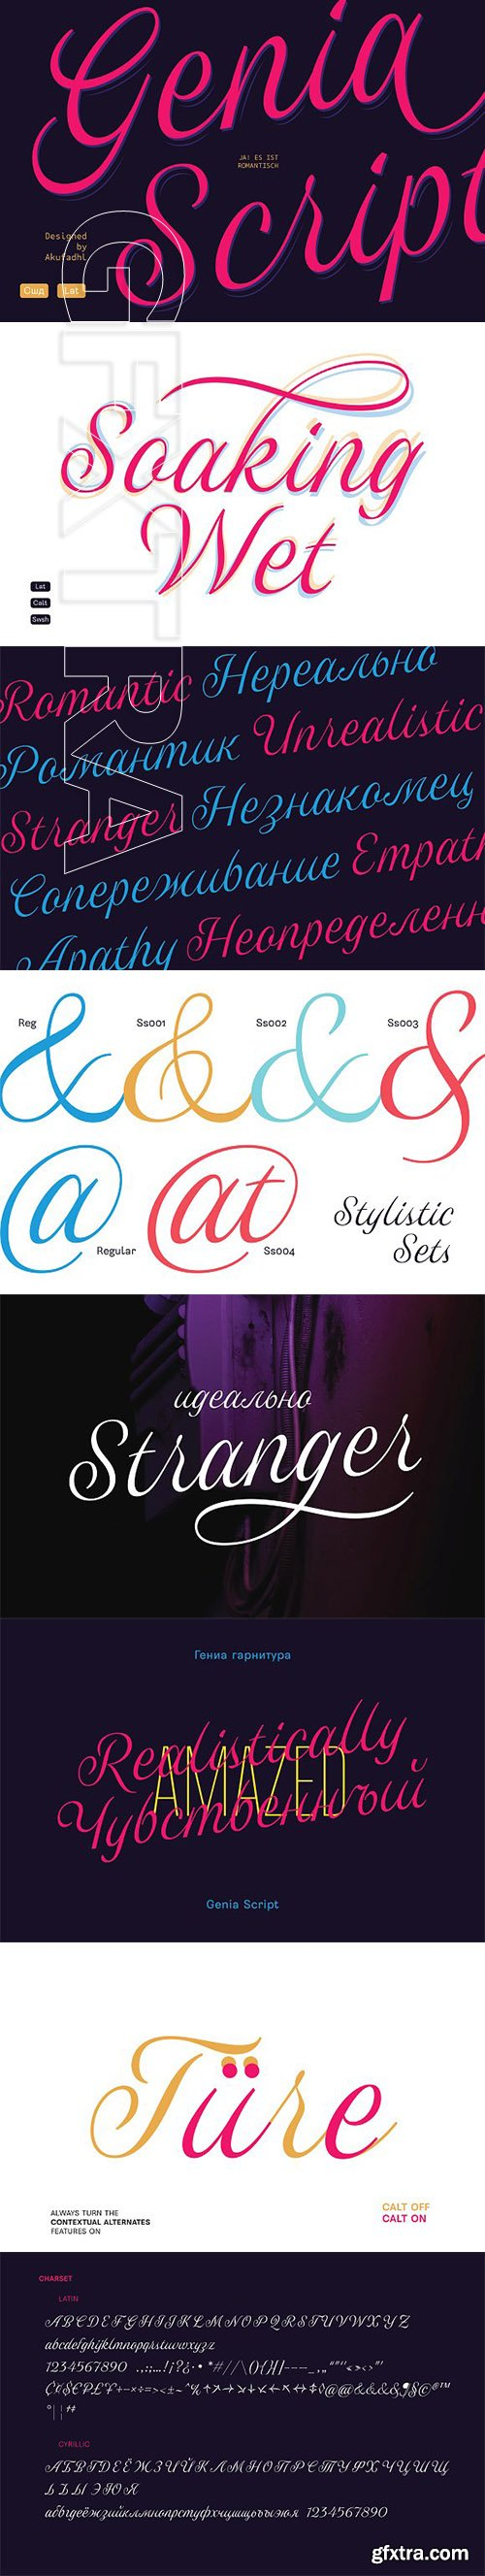 CreativeMarket - Genia Script Typeface 3375467